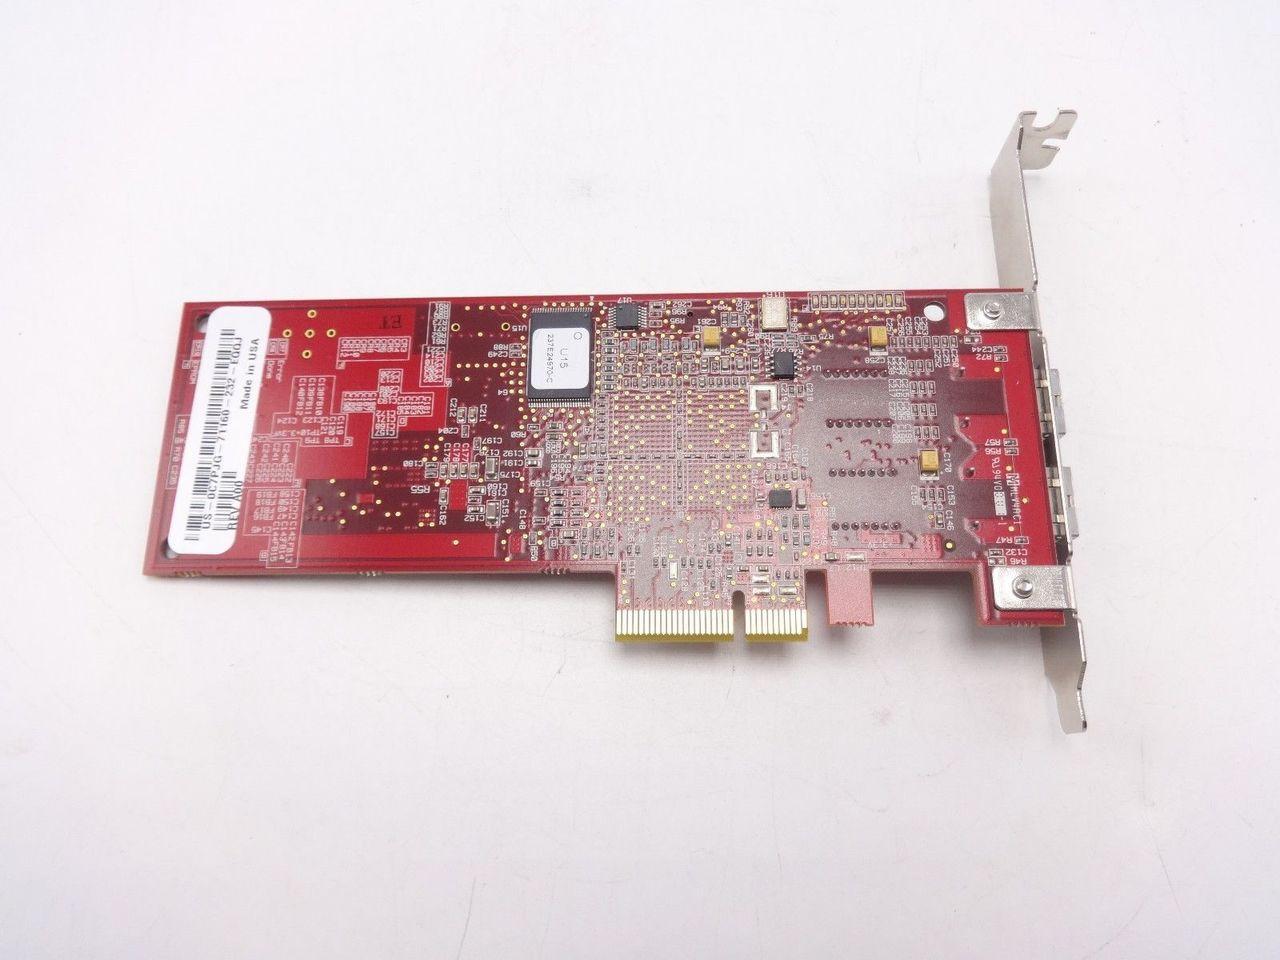 Dell C7PJG Fiber Virtex-5 PCI-E Dual Port XC5VLX50T